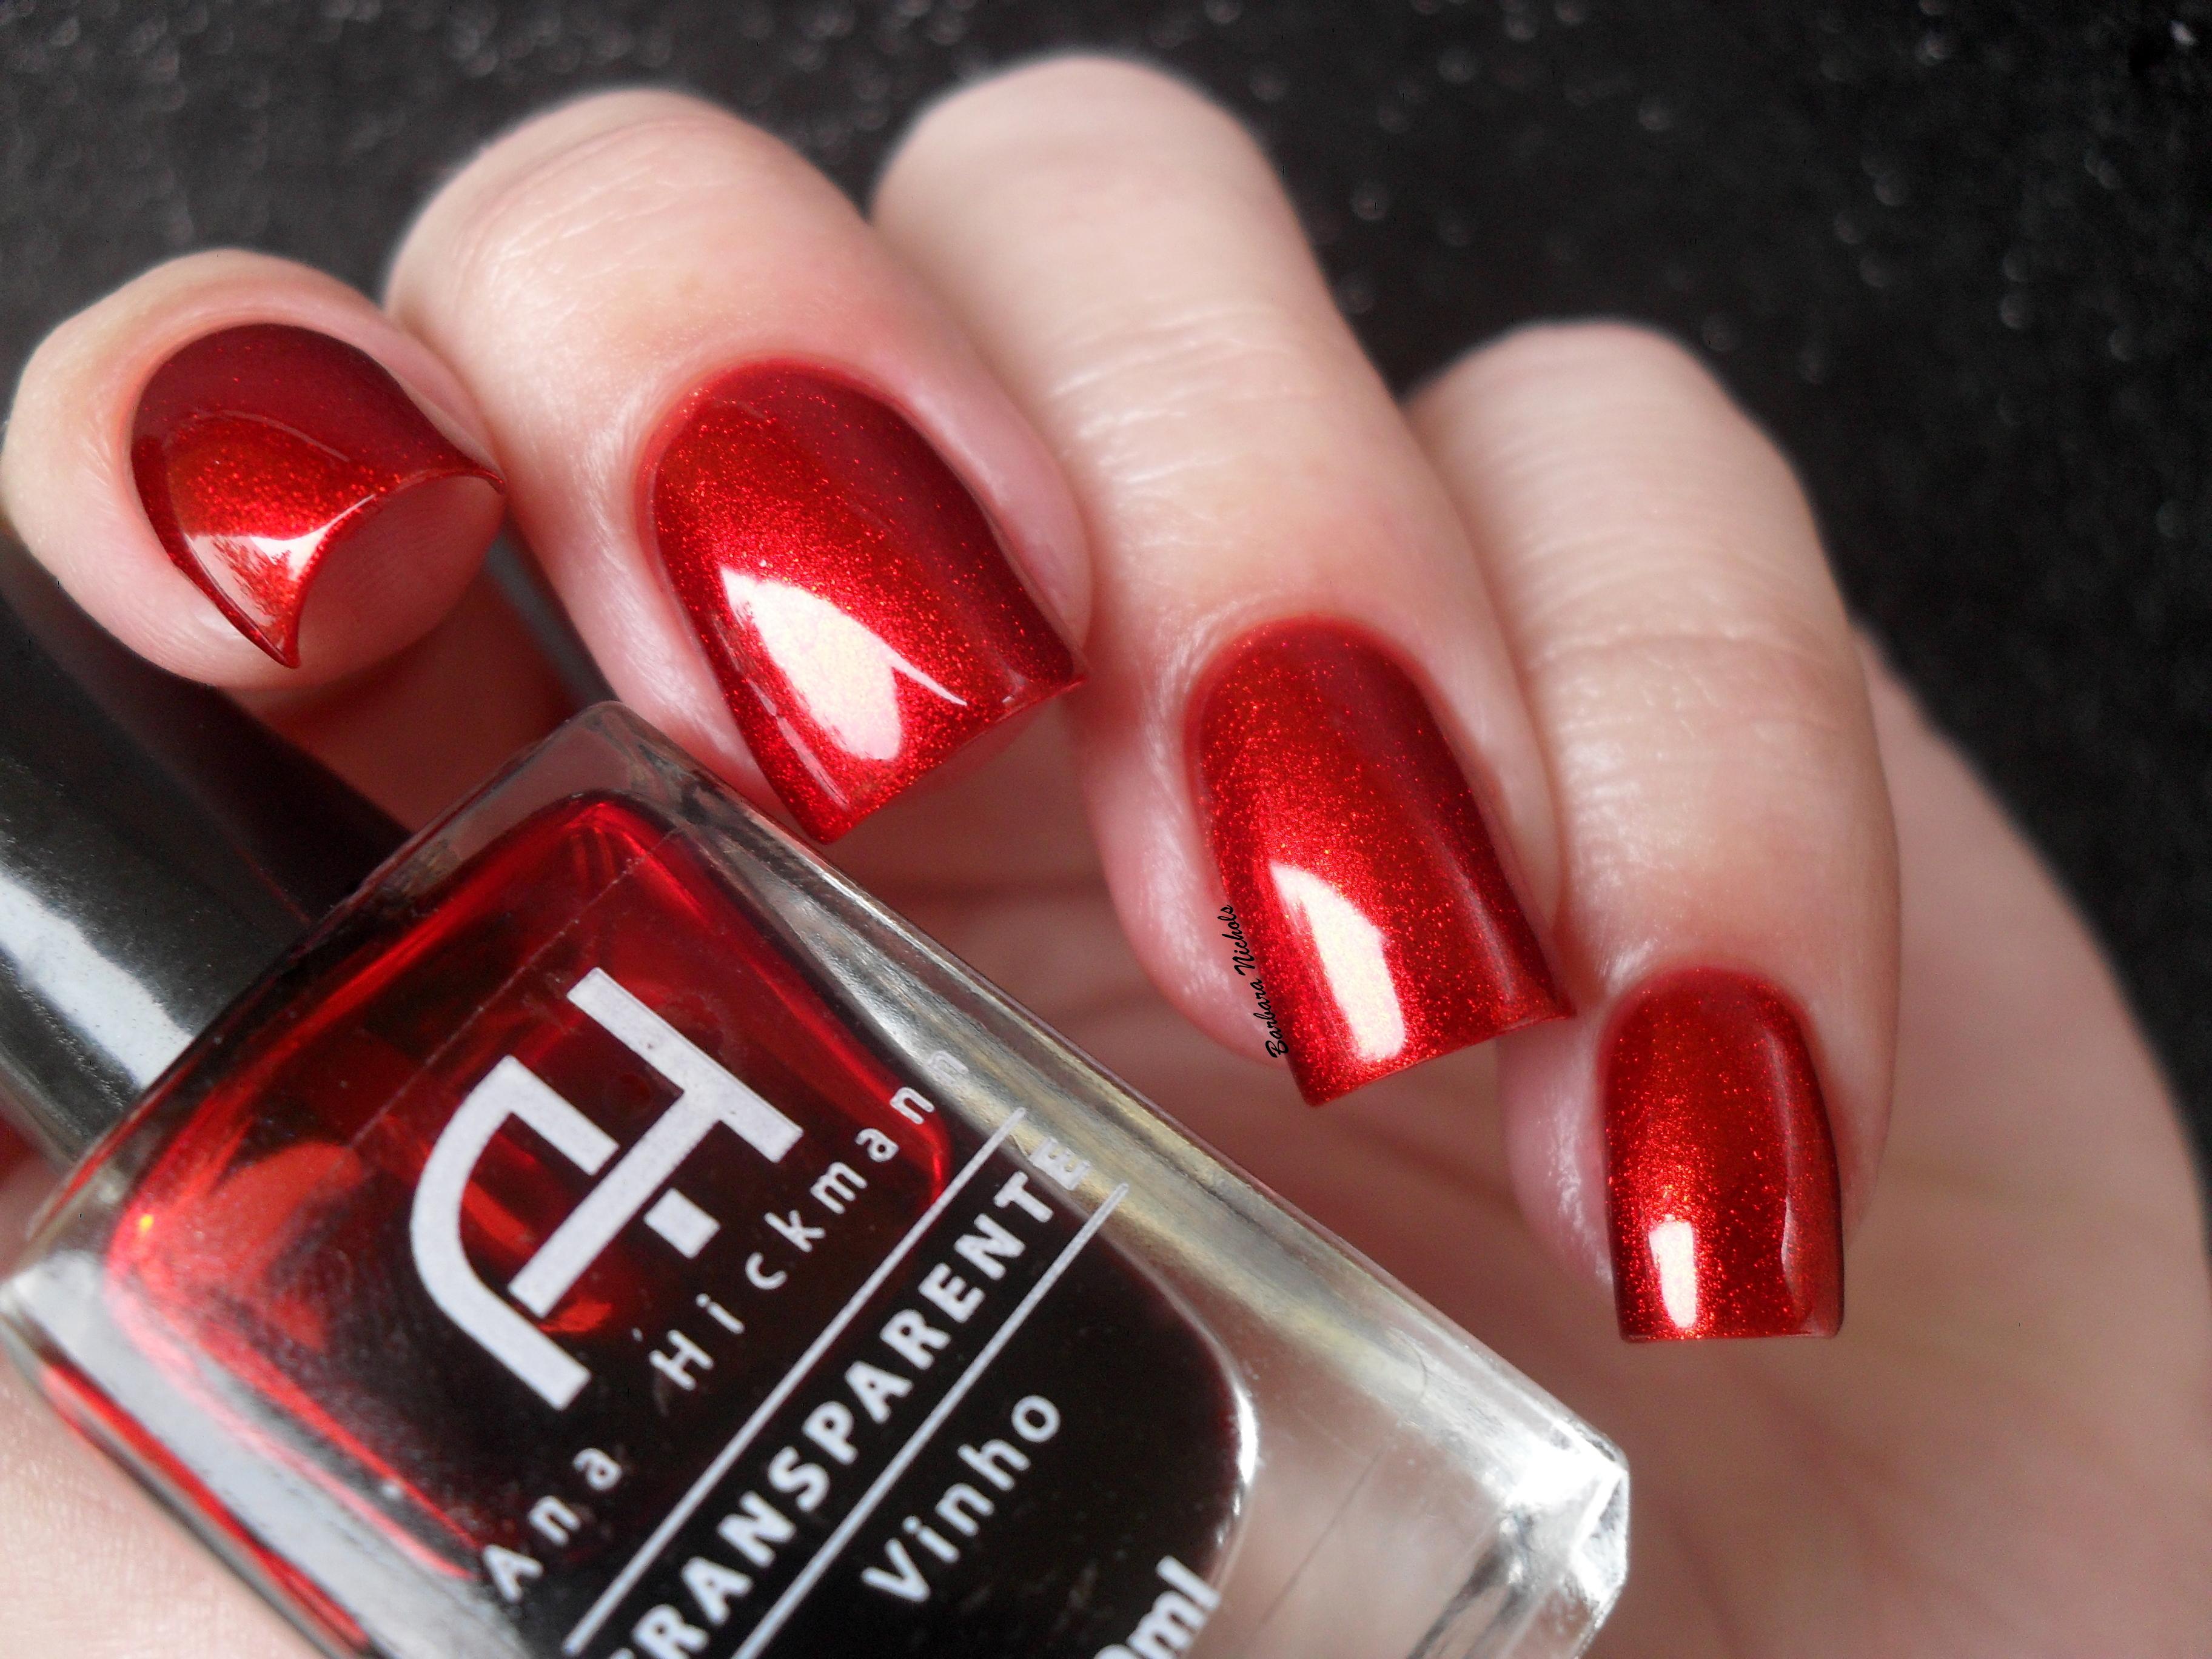 Red Gold Nails Hand Nail Finger Cosmetics Nailpolish Dourado M Os Vermelho Polish Risque Rednailpolish